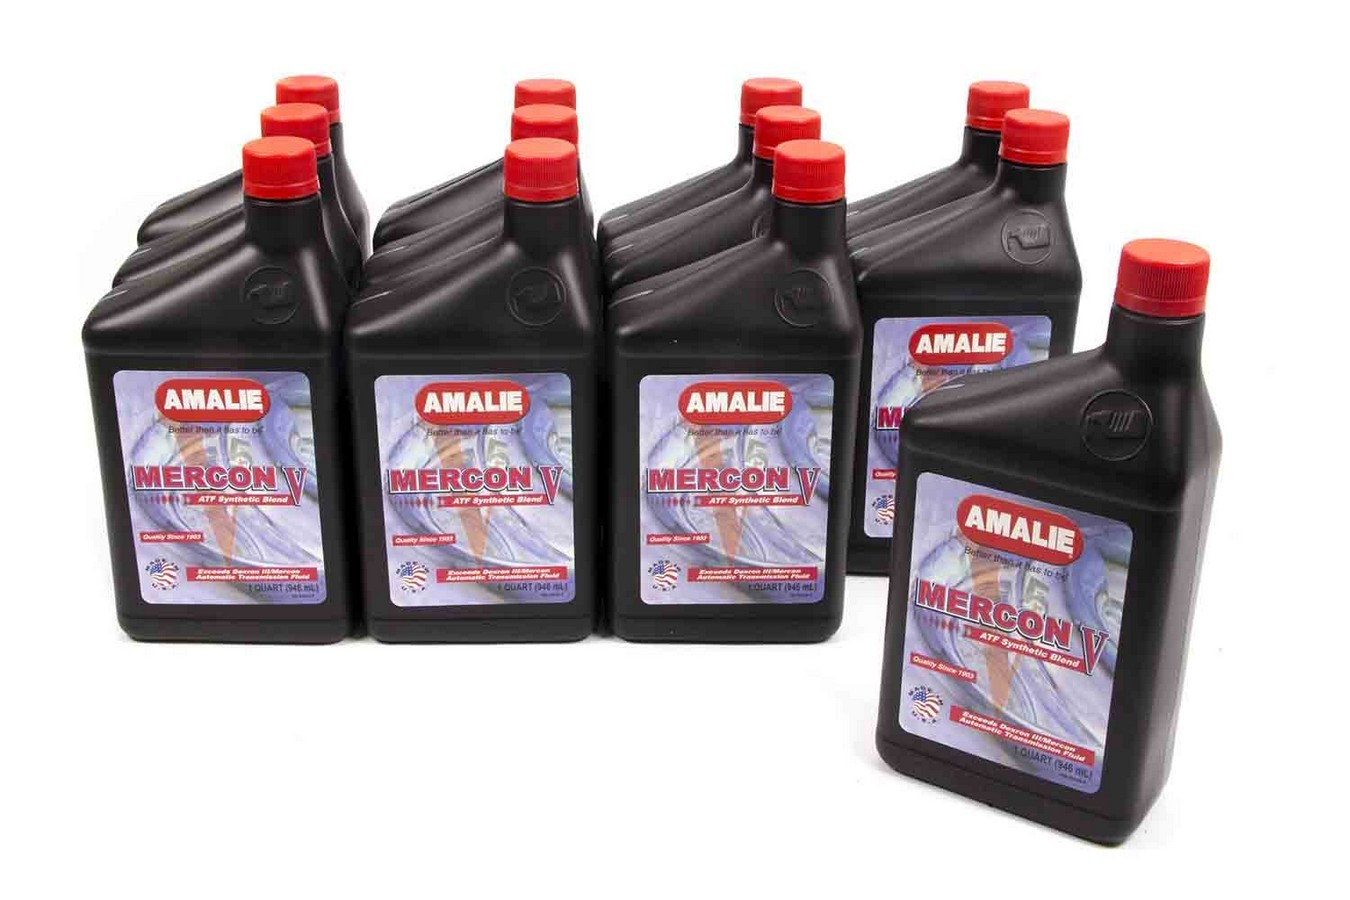 Amalie 160-62856-56 Transmission Fluid, Mercon V, ATF, Semi-Synthetic, 1 qt Bottle, Set of 12